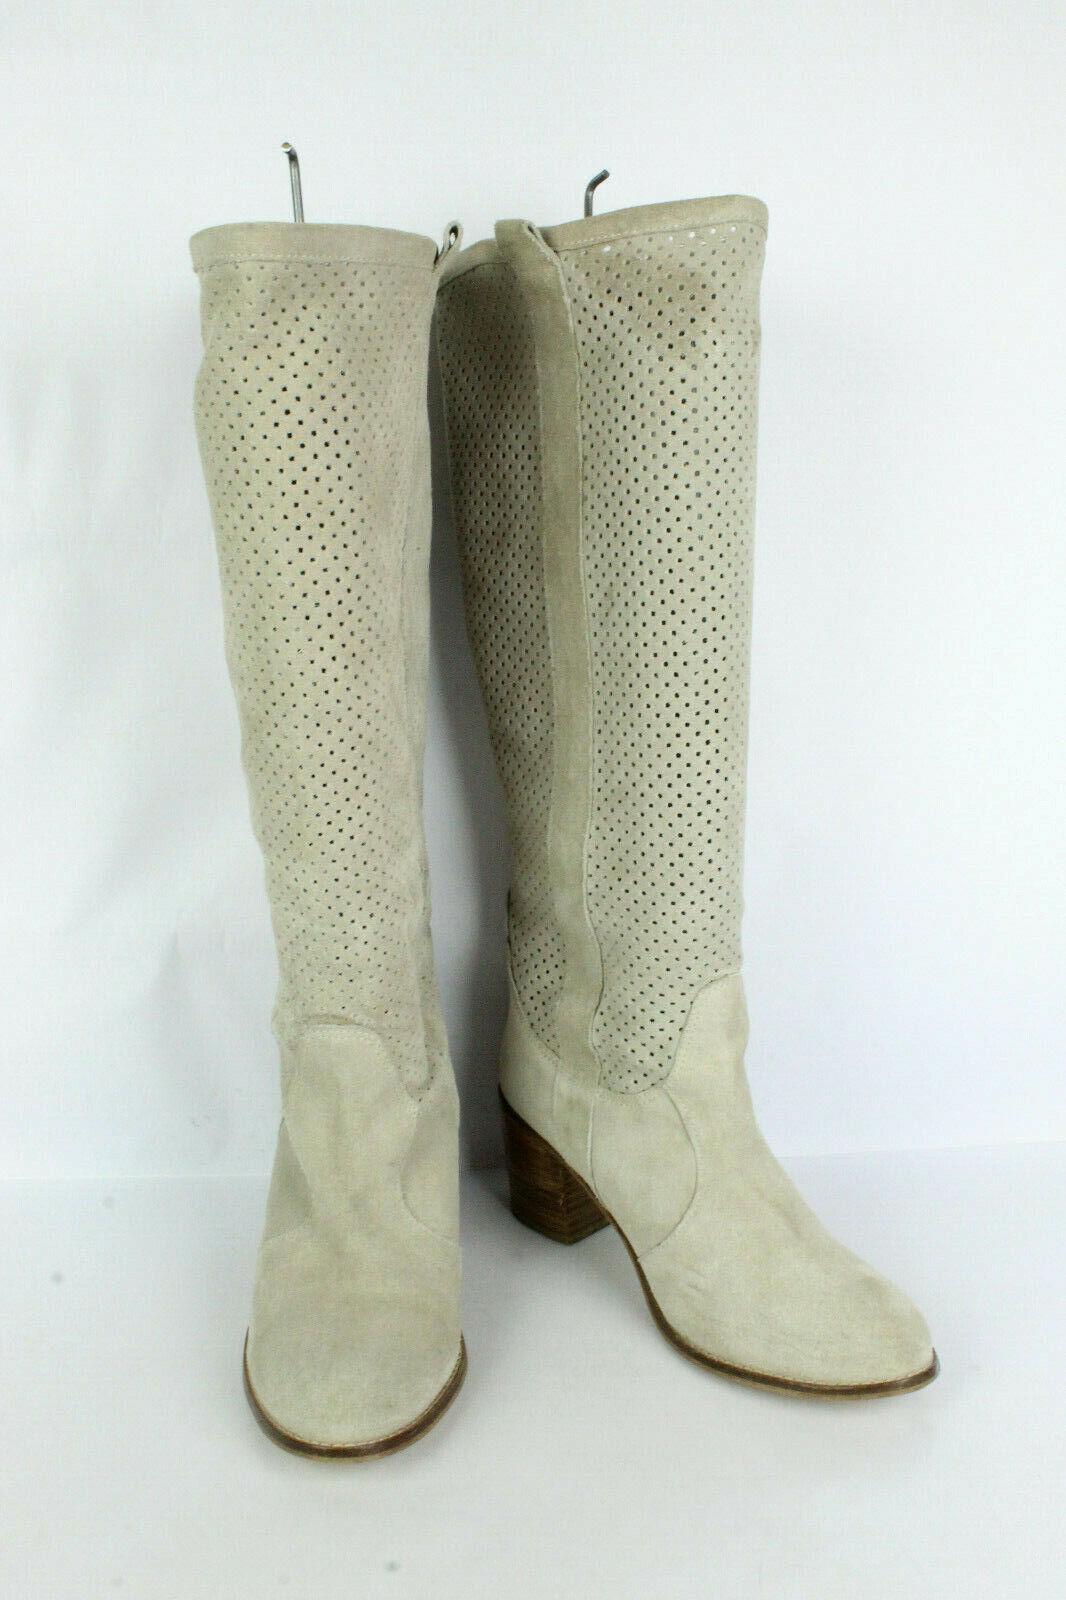 Tamaris Damen Sling Pumps 1 29608 20 Leder Stiletto